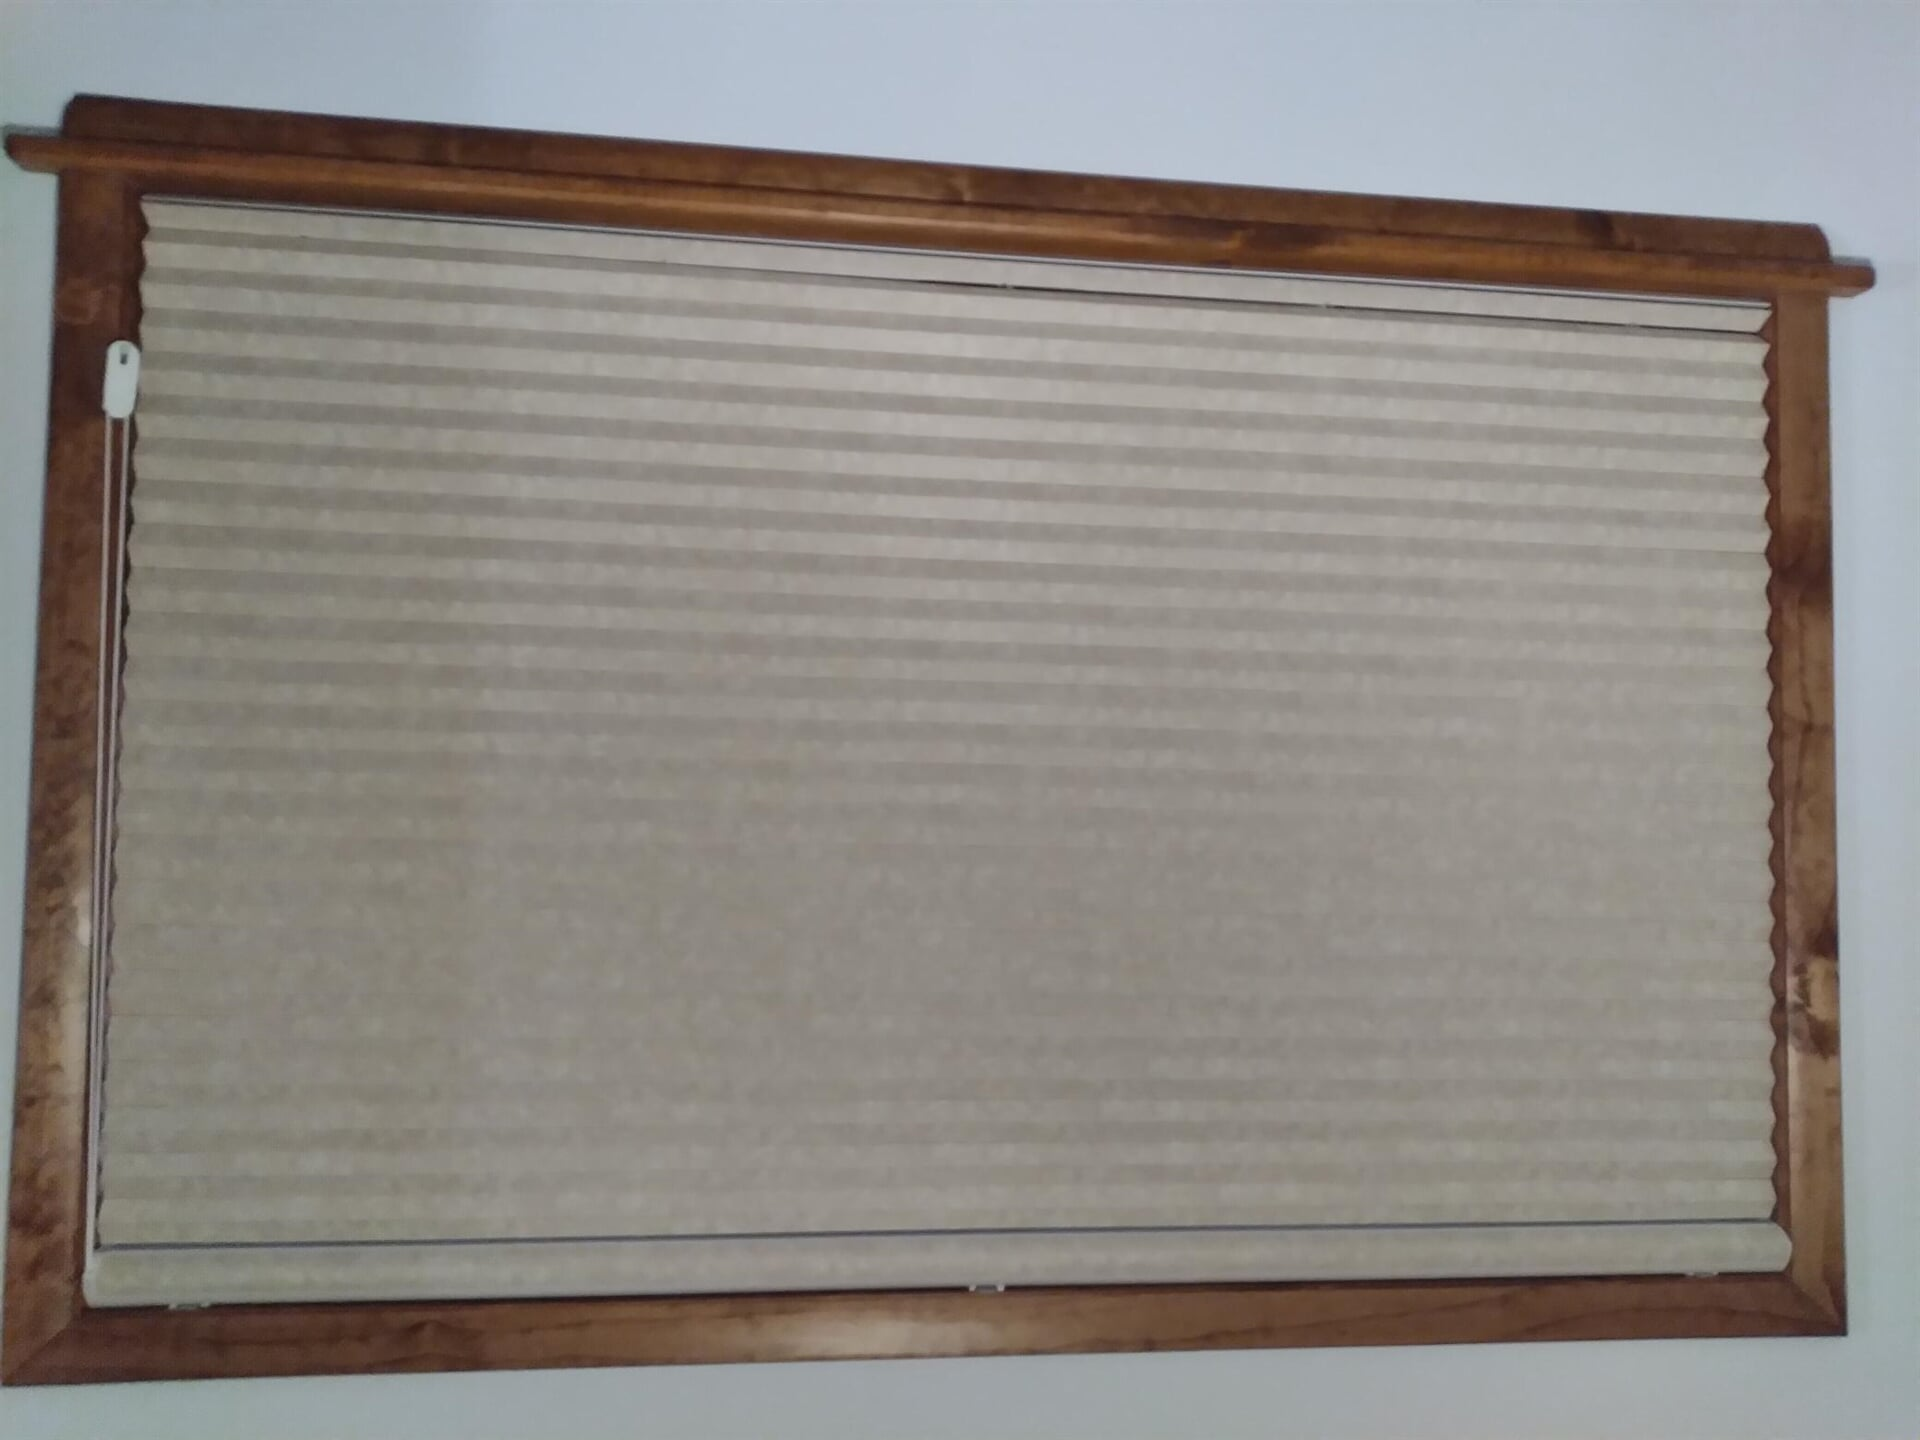 Window Coverings in Scranton, PA from Kissingers Floor & Wall